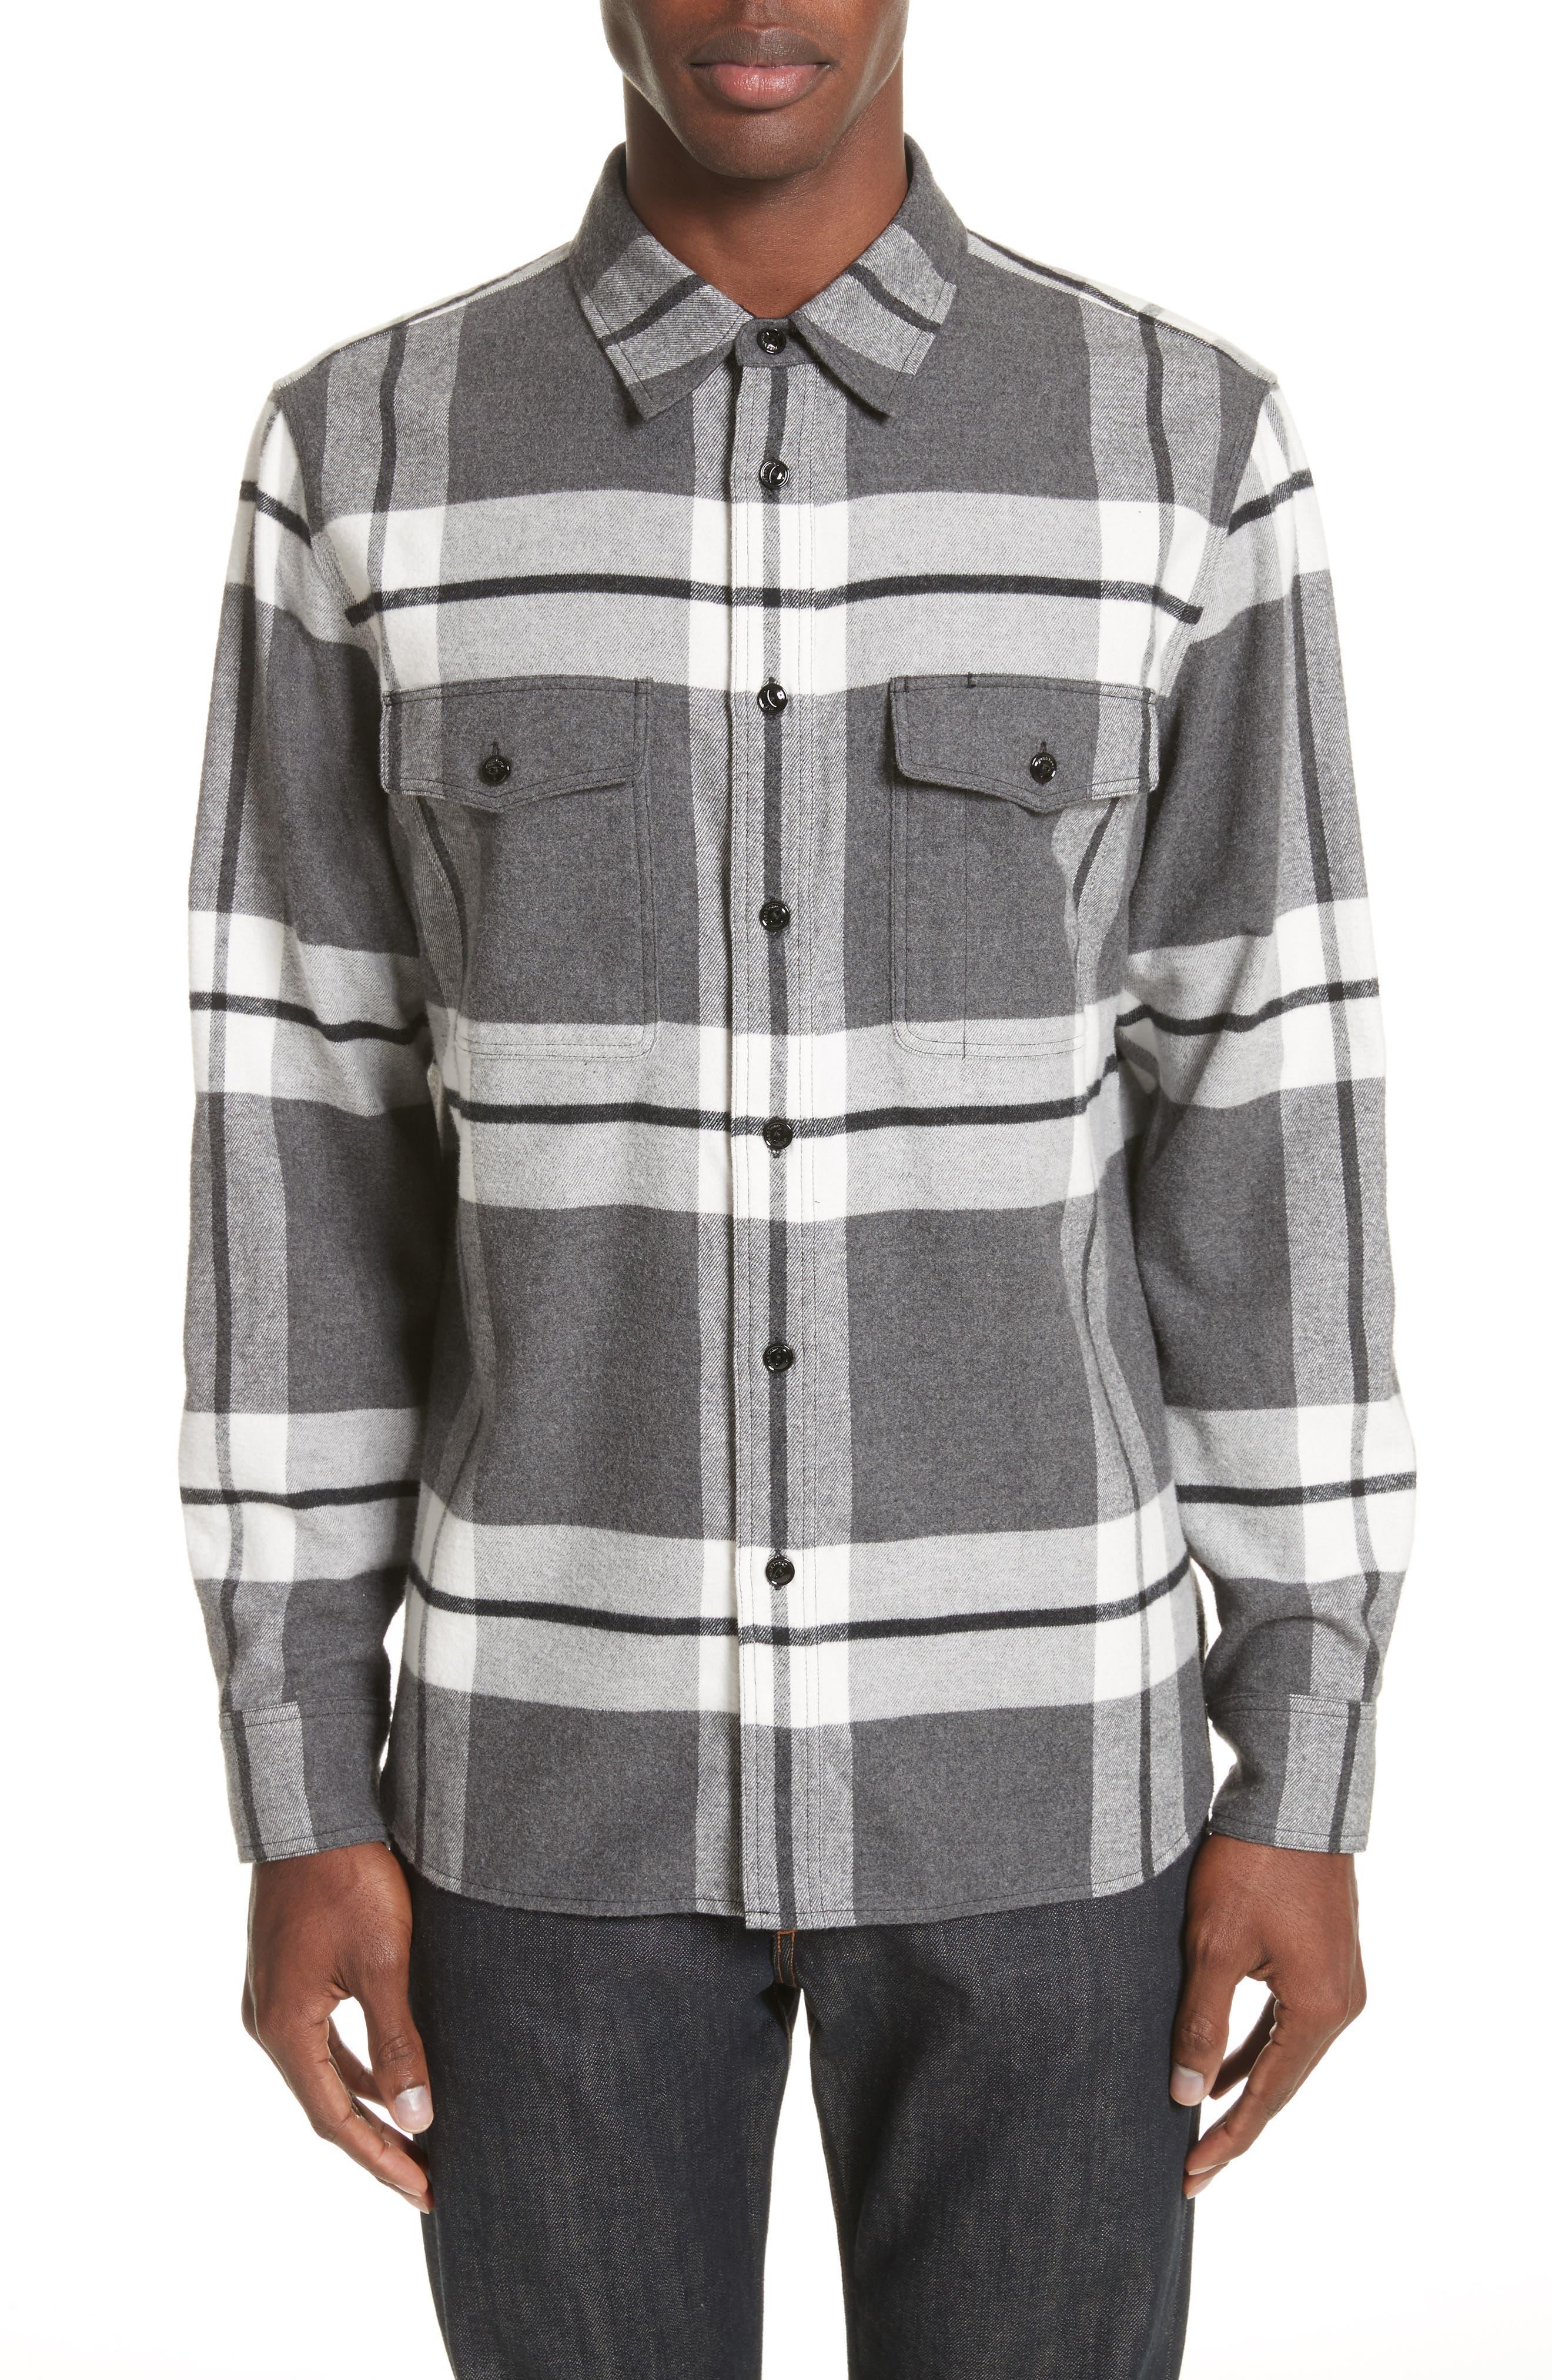 rag & bbone Jack Plaid Shirt Jacket,                         Main,                         color, Grey/Wht